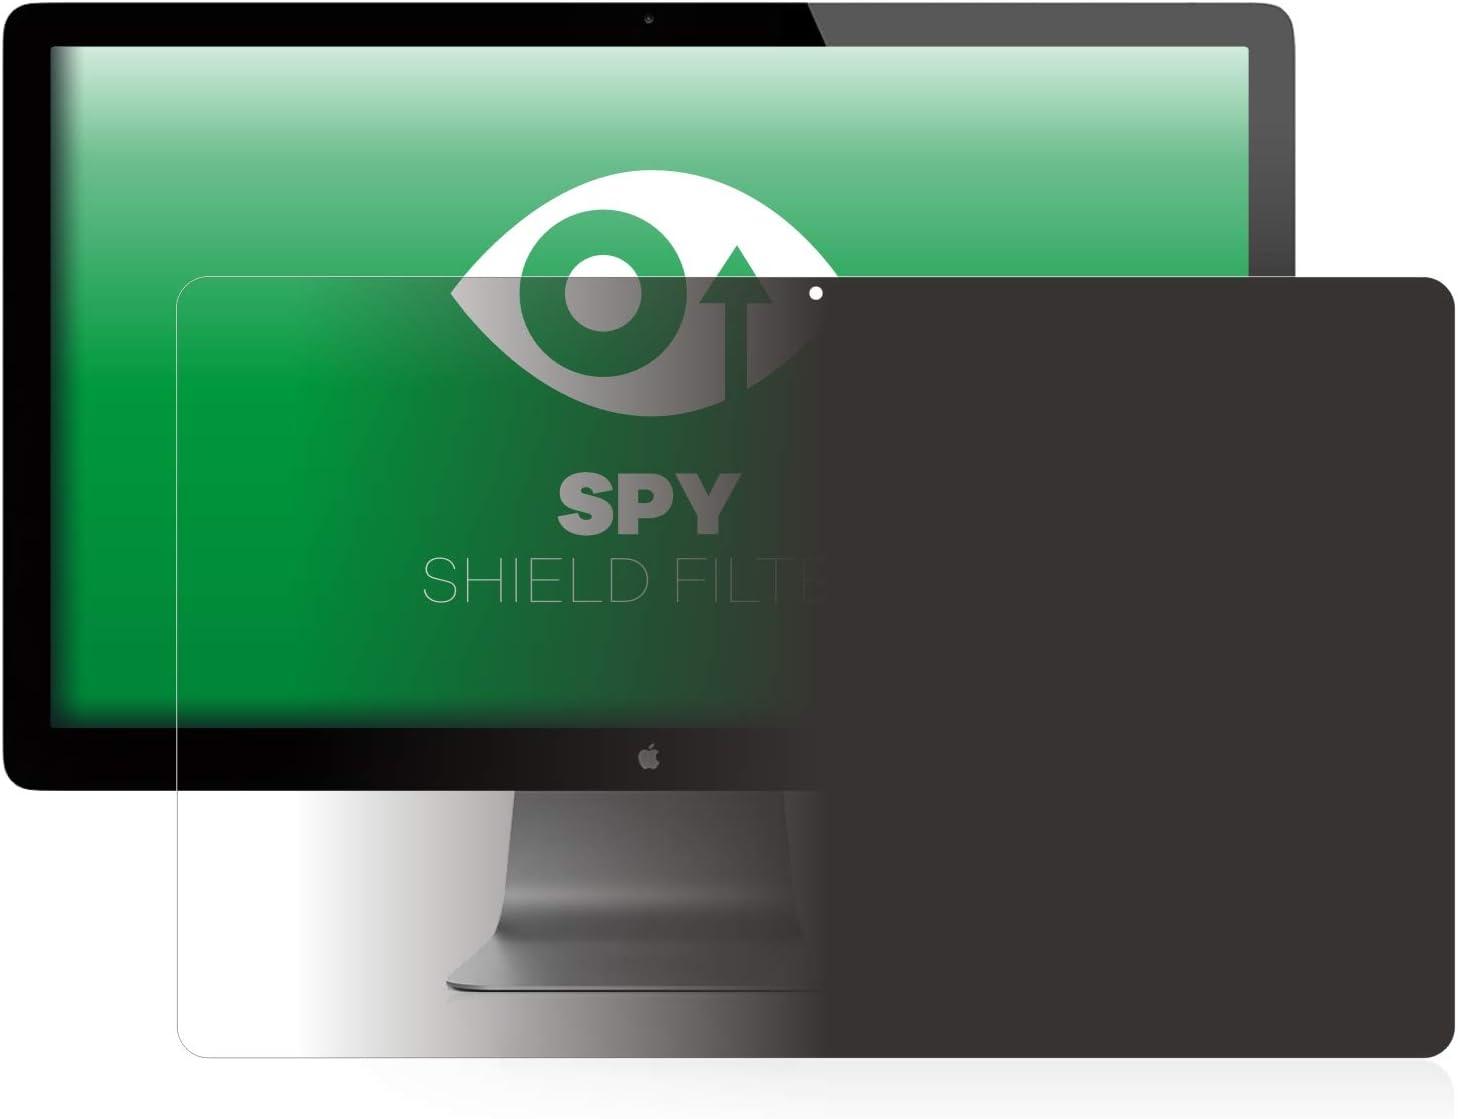 Anti-Spy Blickschutzfolie Sichtschutz-Folie upscreen Blickschutzfilter kompatibel mit Apple Thunderbolt Display 27 Privacy Filter